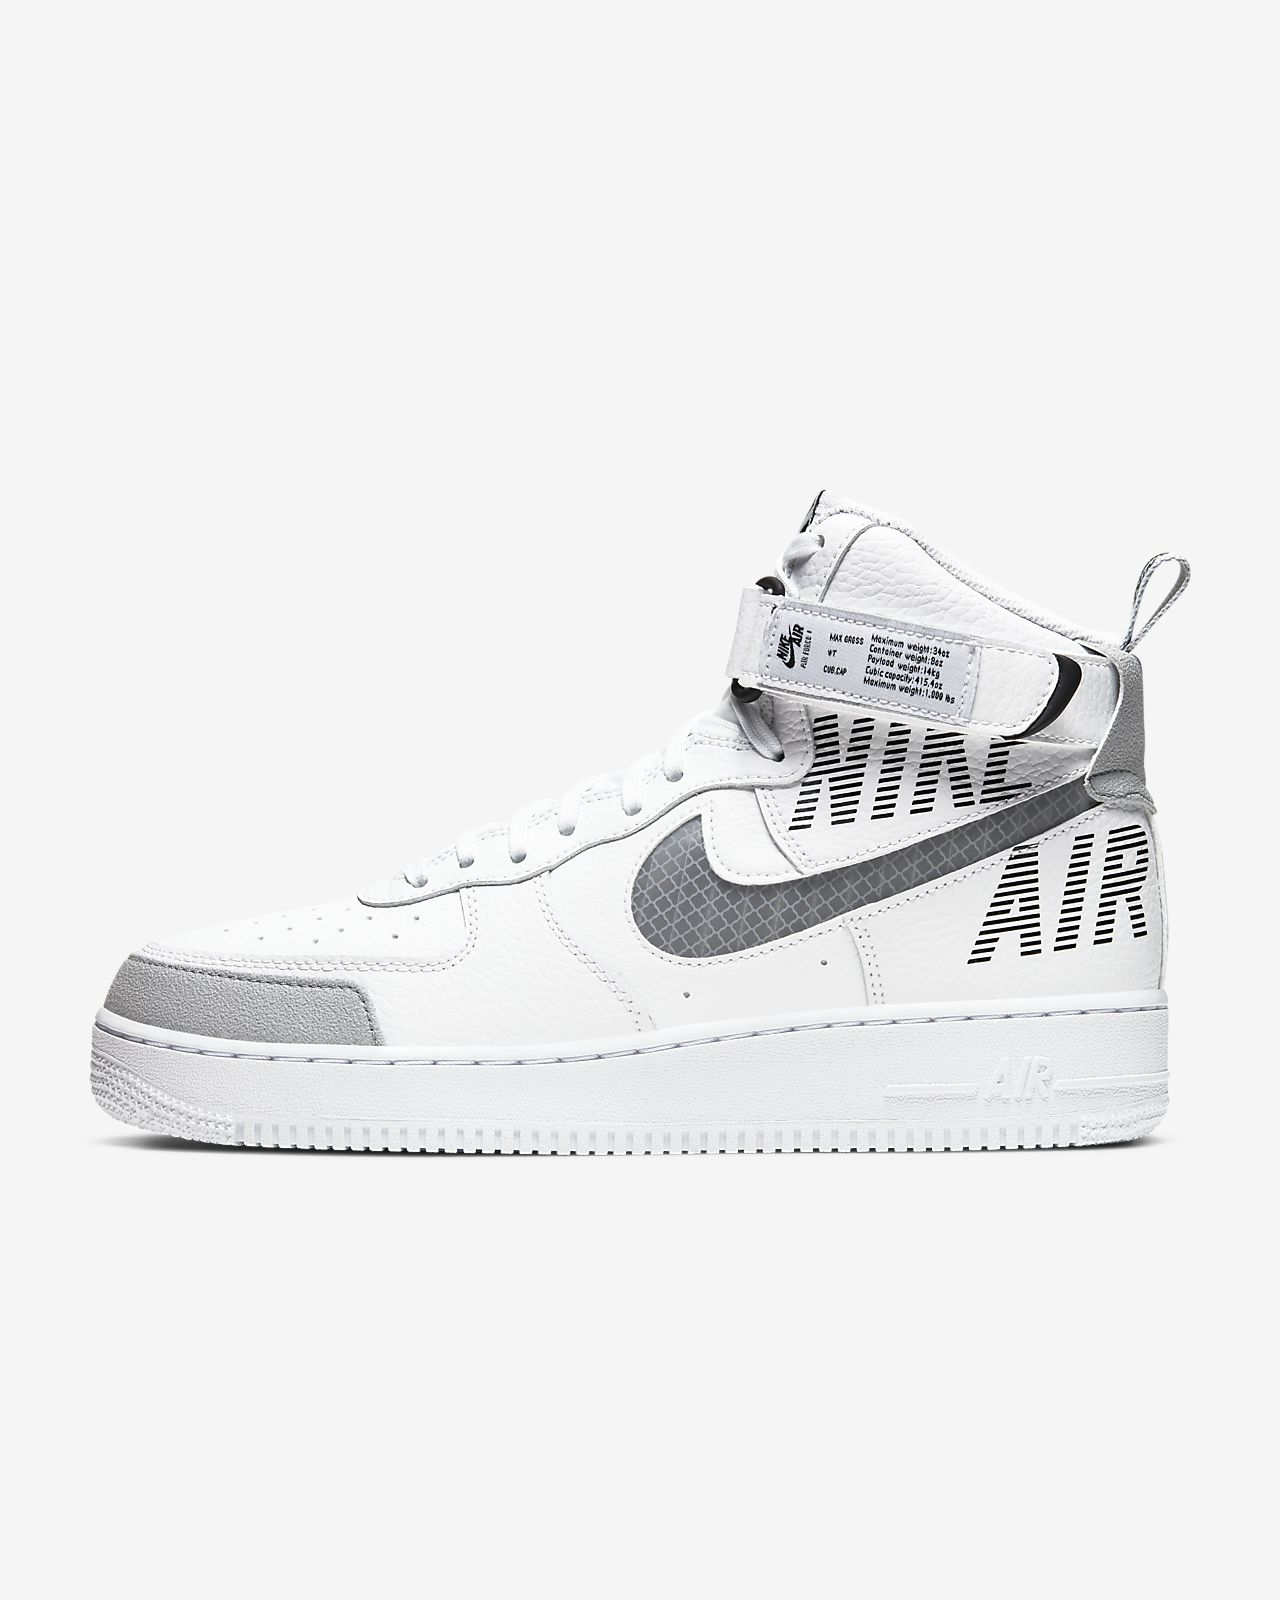 Nike Air Force 1 High '07 LV8 2 Herenschoen